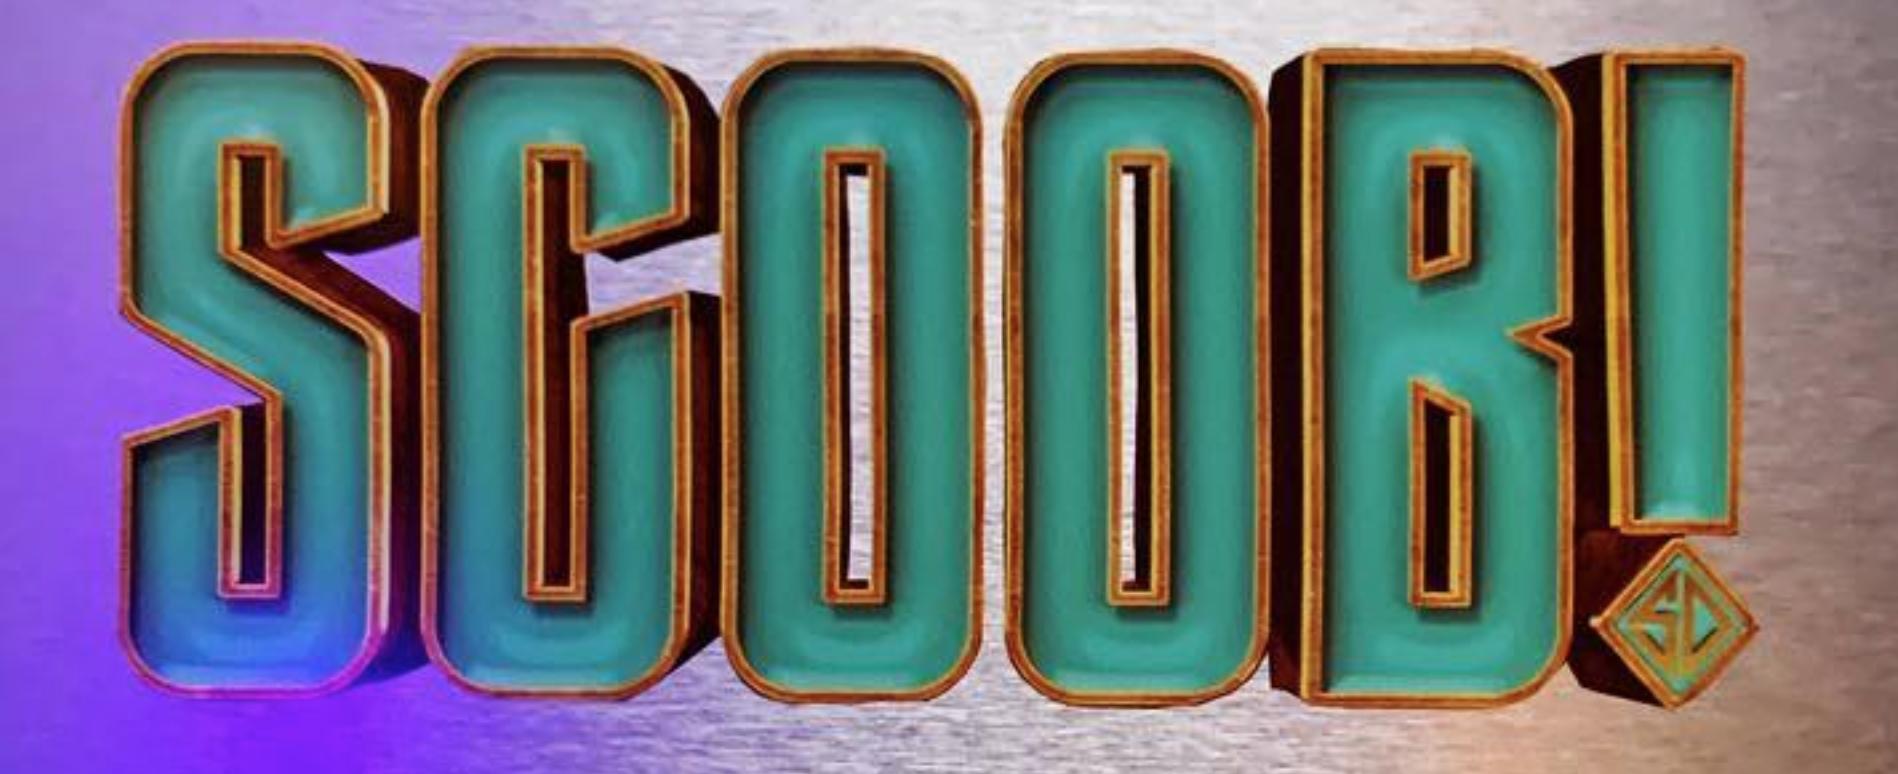 """SCOOB!"" Title Card"